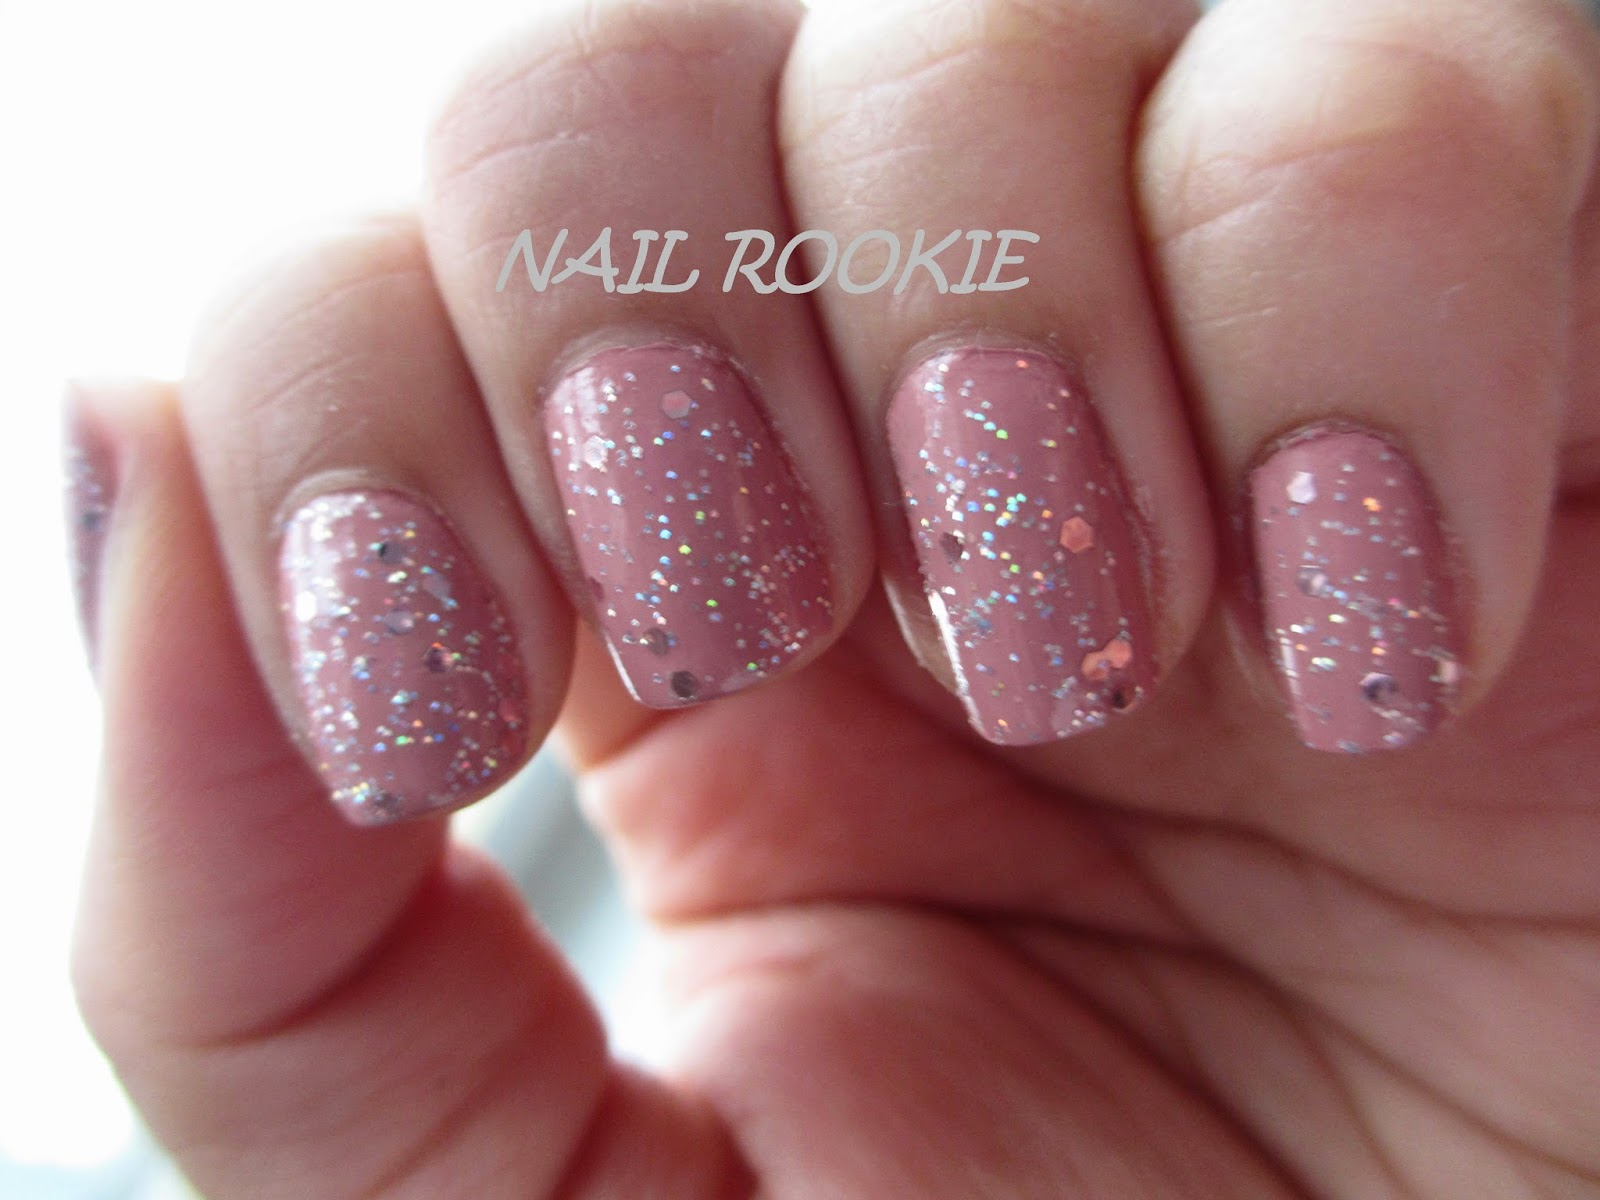 Nail Rookie Pixie Dust